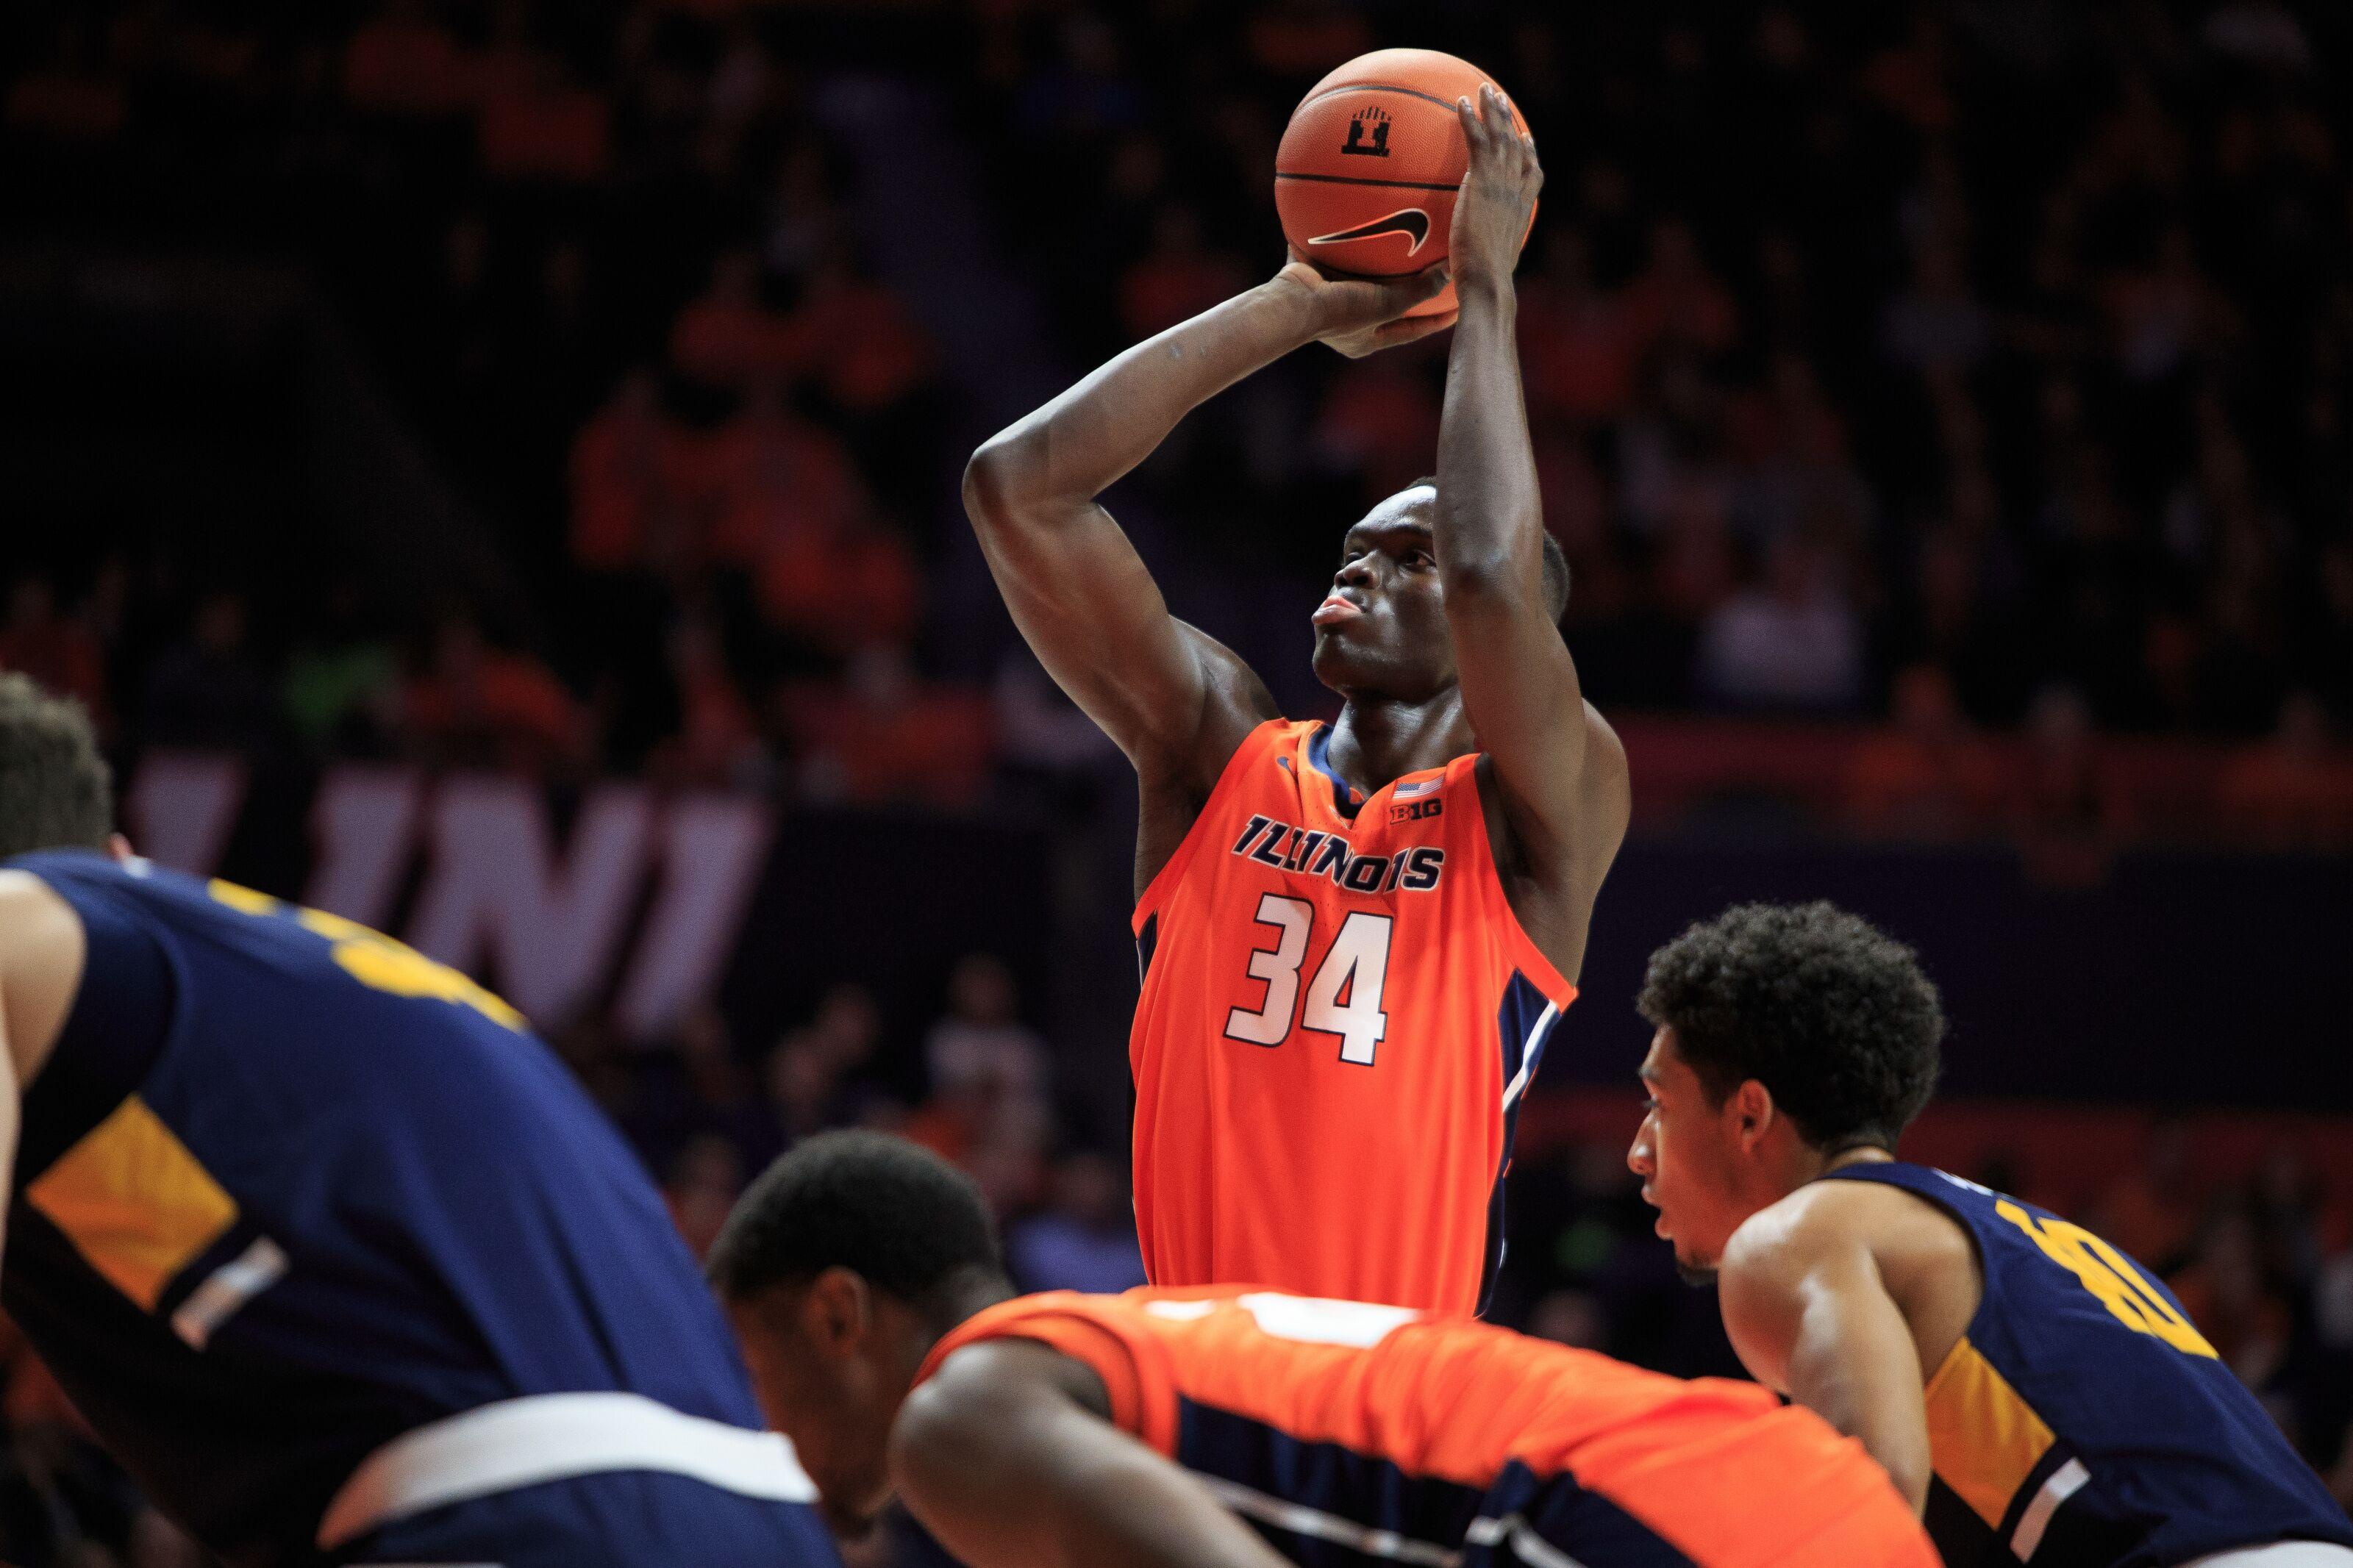 Illinois Basketball: Illini lose backup center Samba Kane to transfer